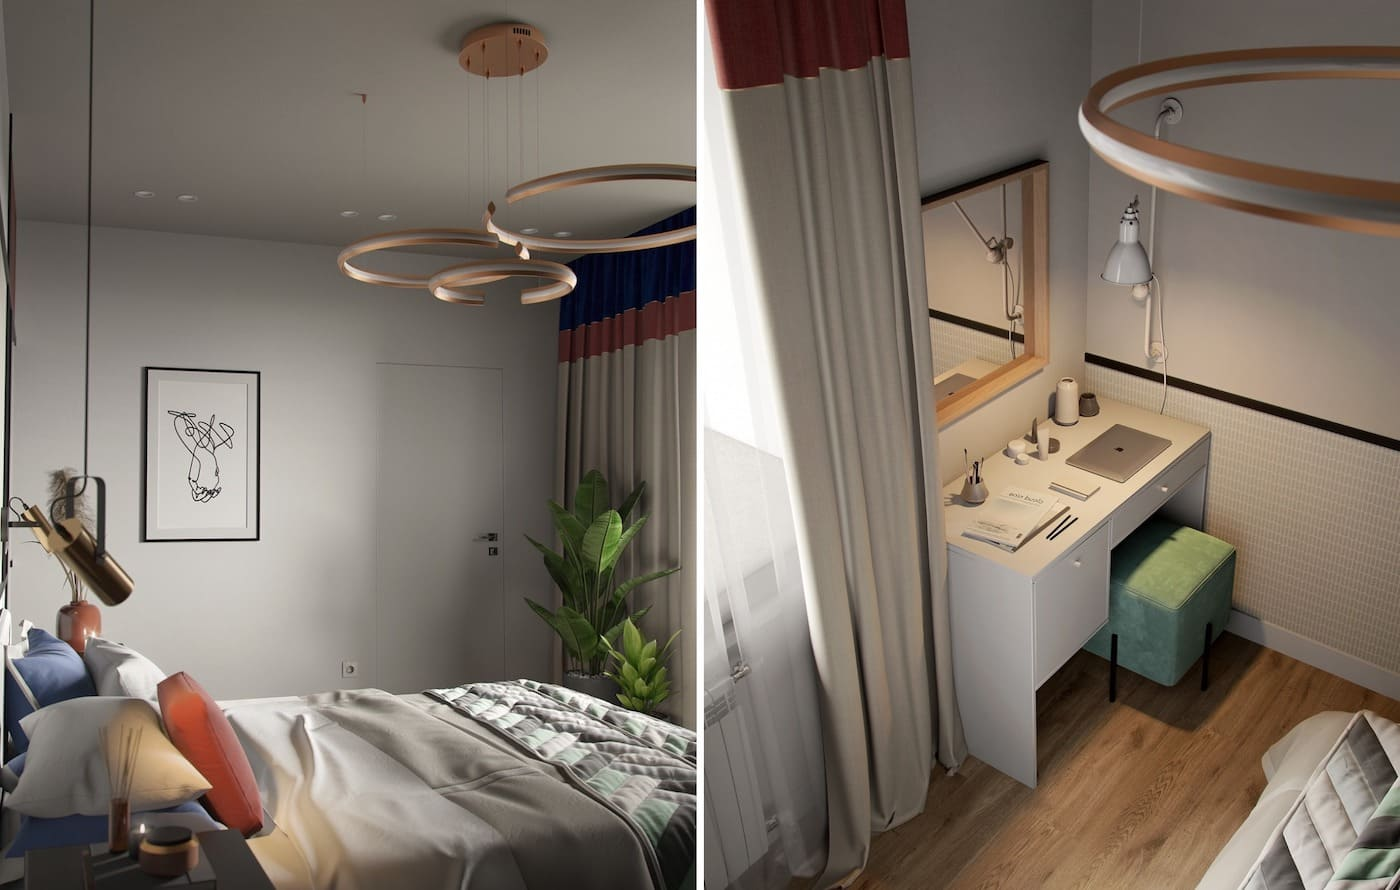 дизайн интерьера модной квартиры фото 59